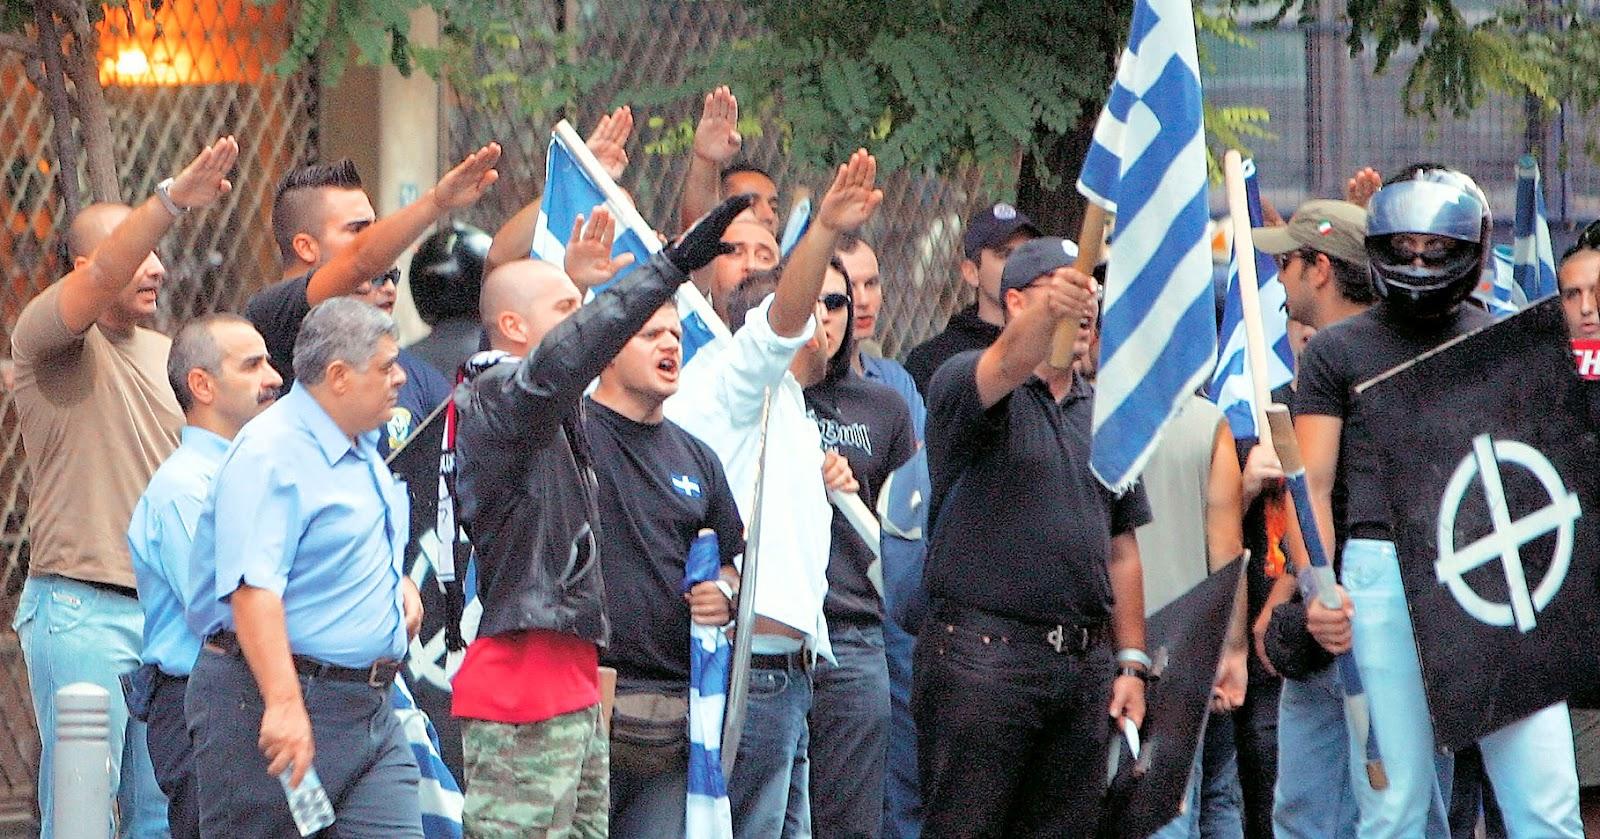 grece-aube-dorc3a9e-extrc3a8me-droite.jpg